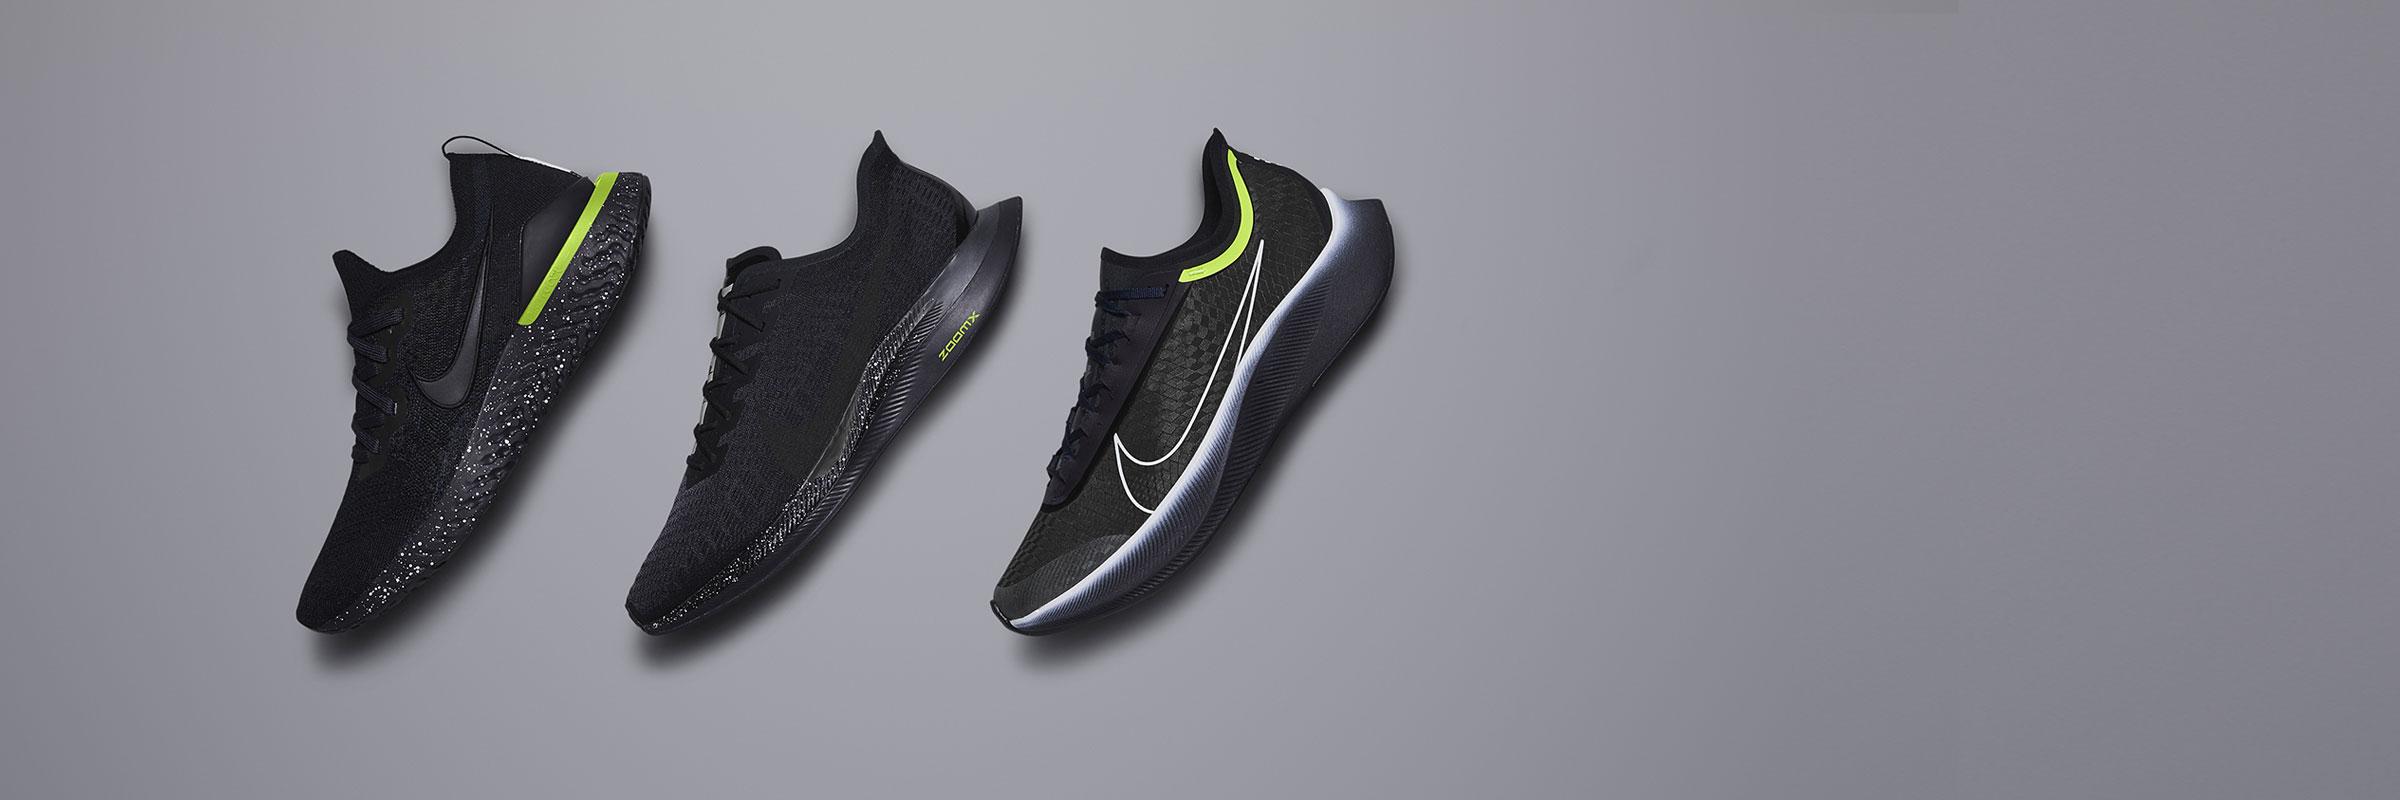 Nike Dark Arts